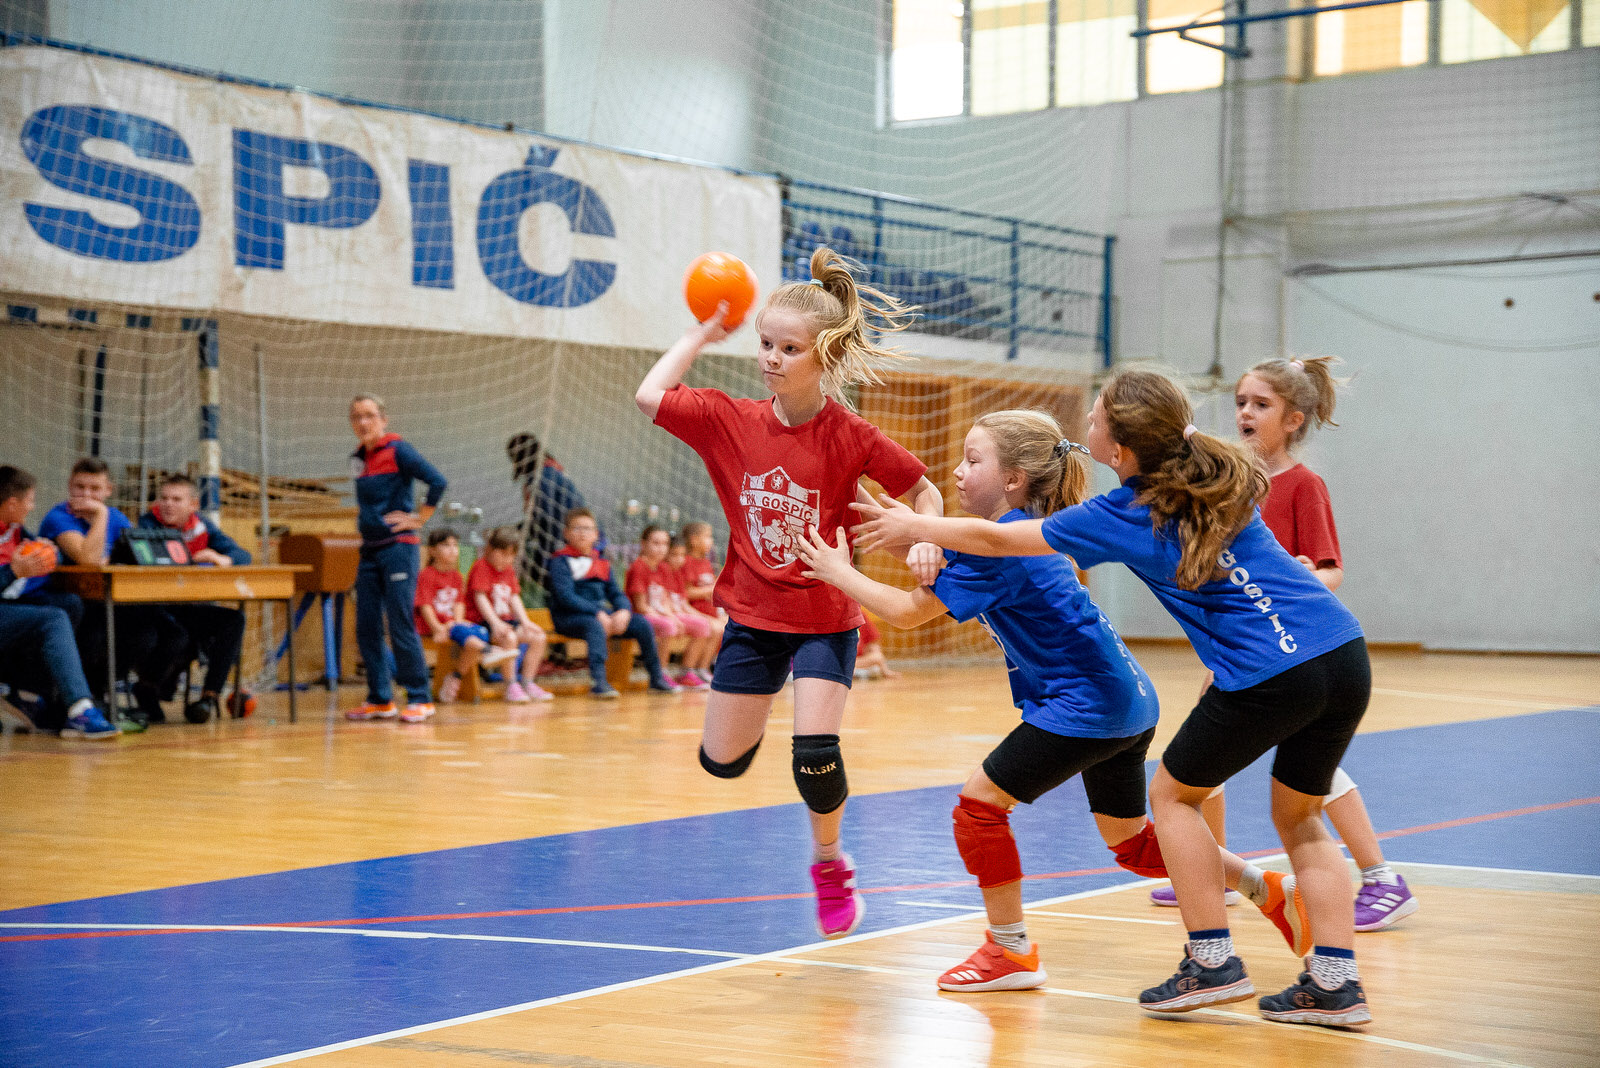 likaclub_rk gospić_turnir mali medo_2020 (85)